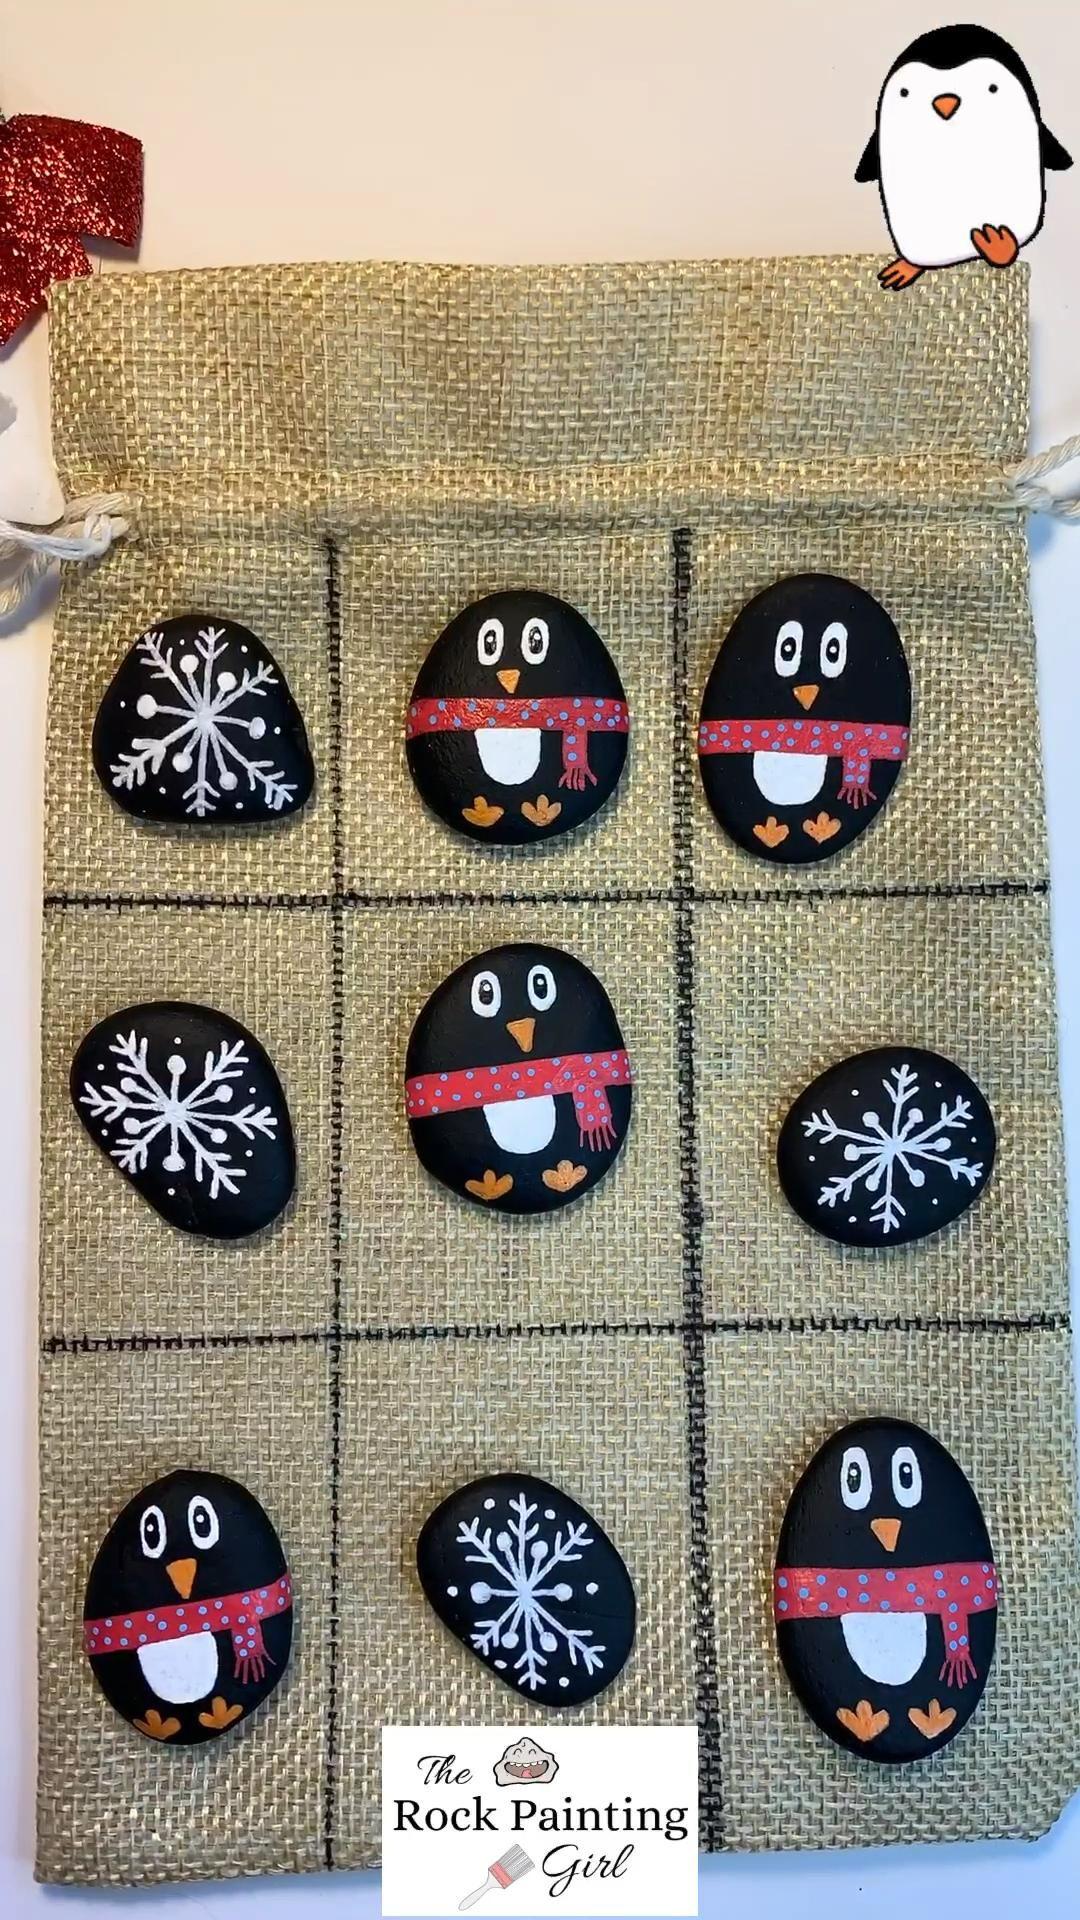 Lil Penguin 🐧 & Snowflake Rocks!